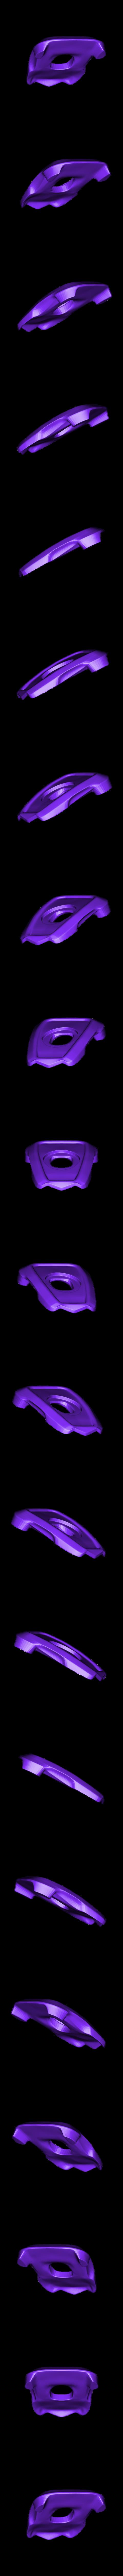 Lucio_modeHolder.stl Download free STL file Overwatch Lucio Blaster • 3D printer object, Adafruit